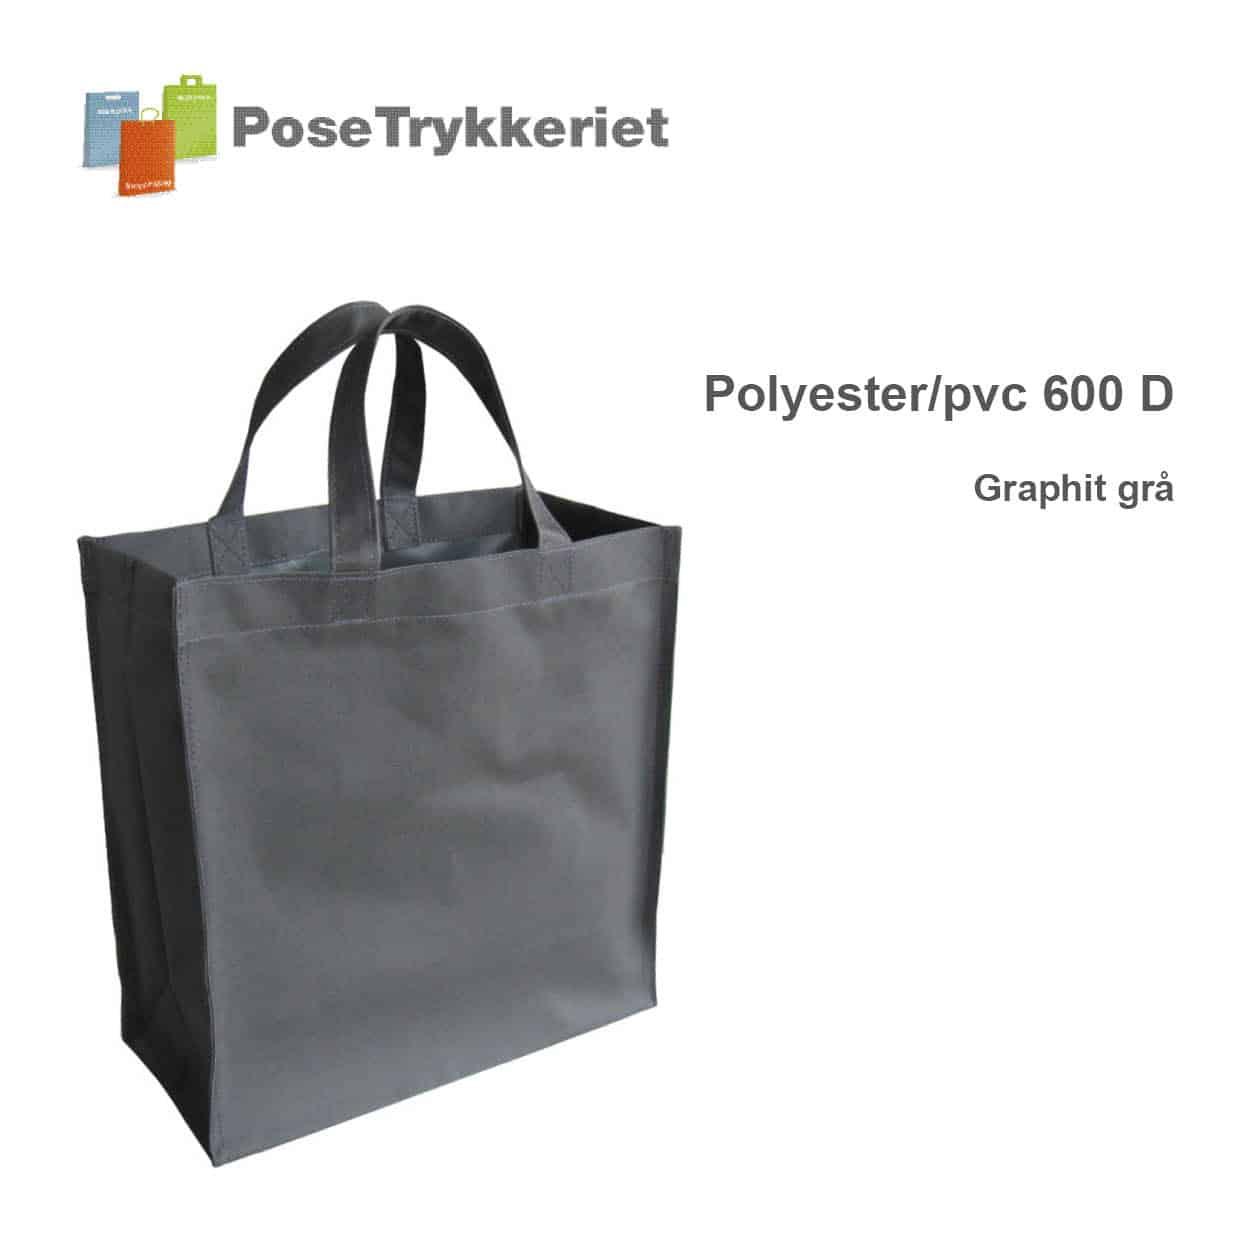 Graphit grå revisorpose 600 D. PoseTrykkeriet.dk